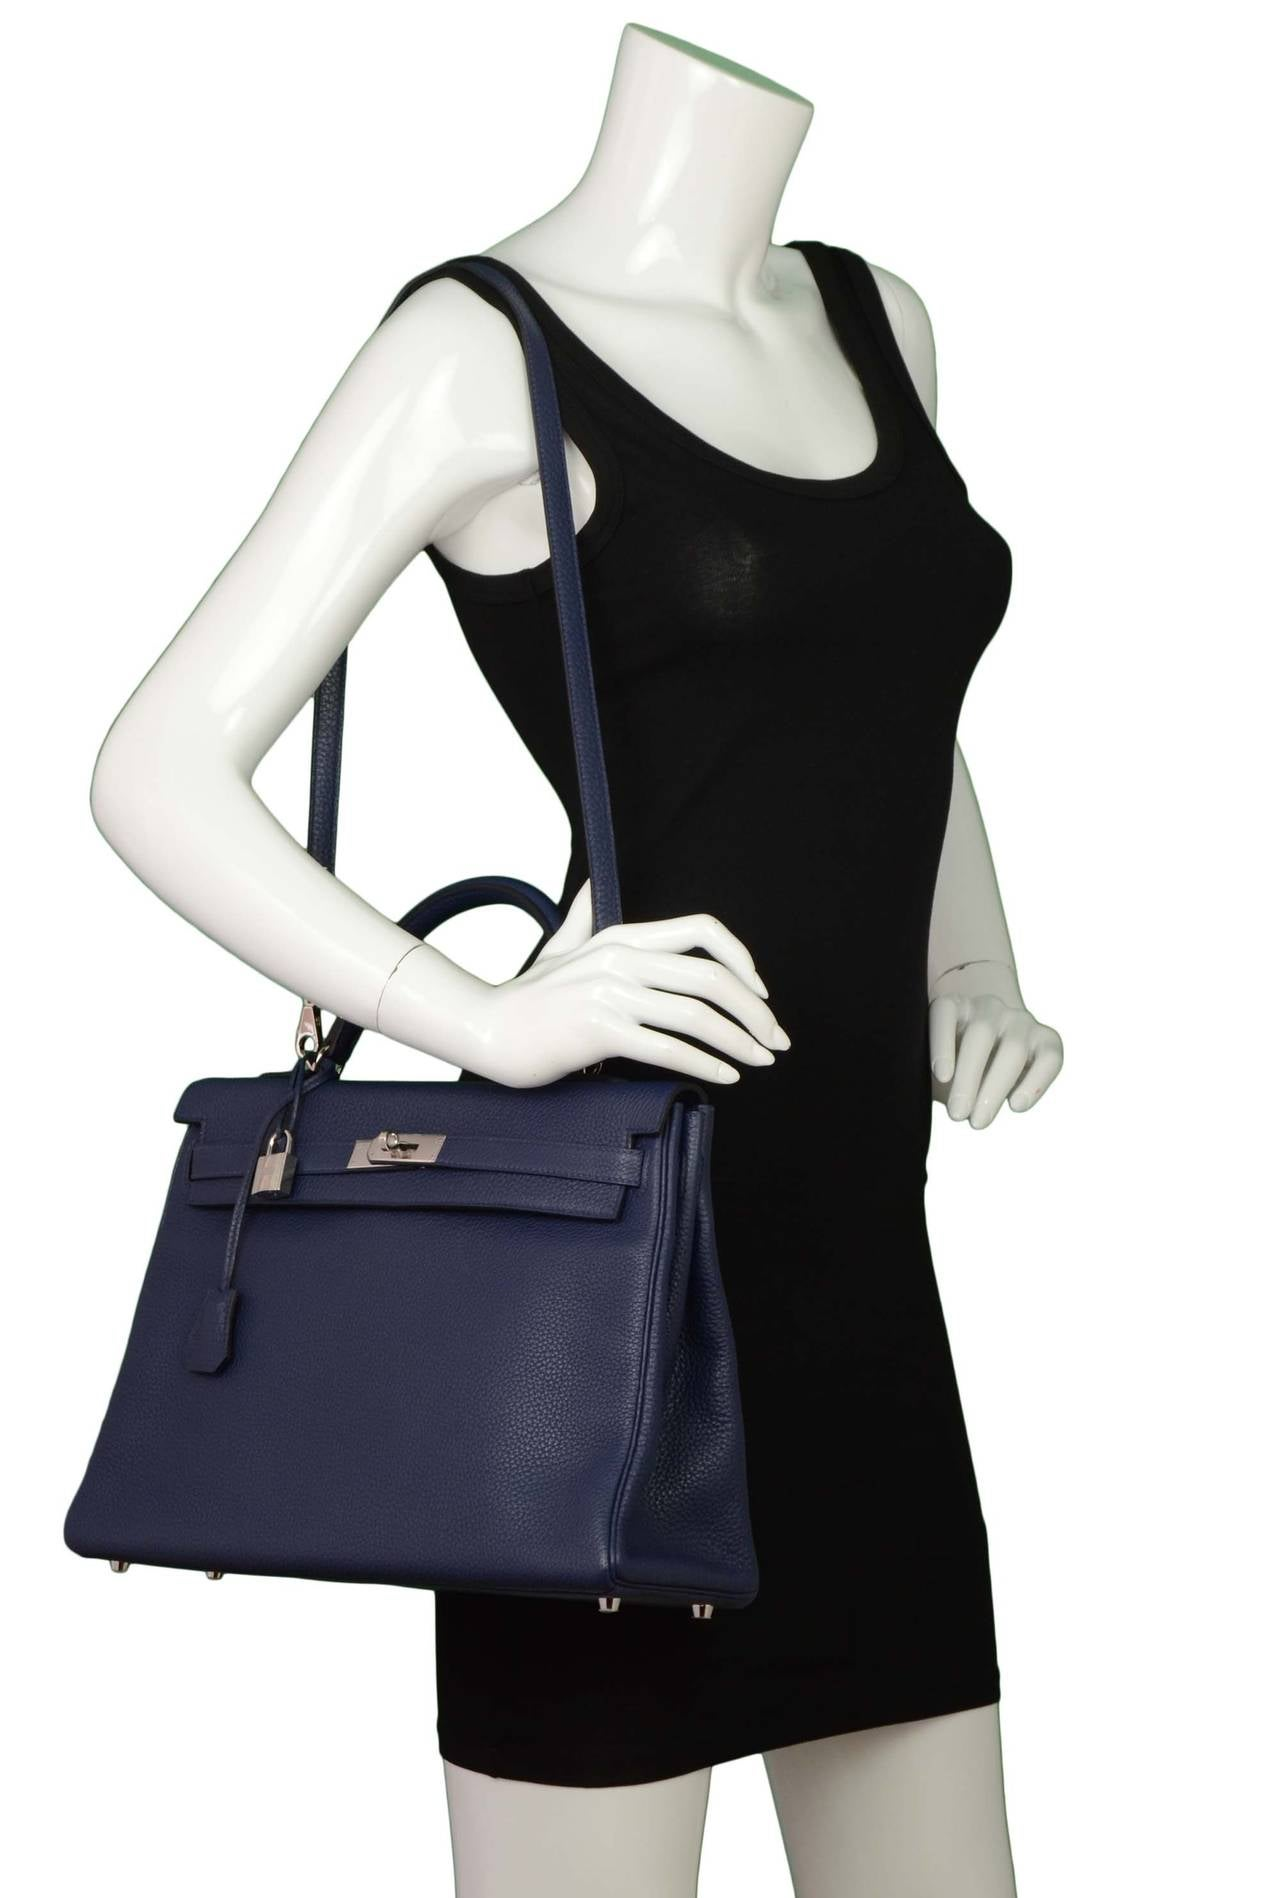 Hermes NEW Navy Bleu Saphir Clemence Leather 35cm Kelly Bag PHW ...